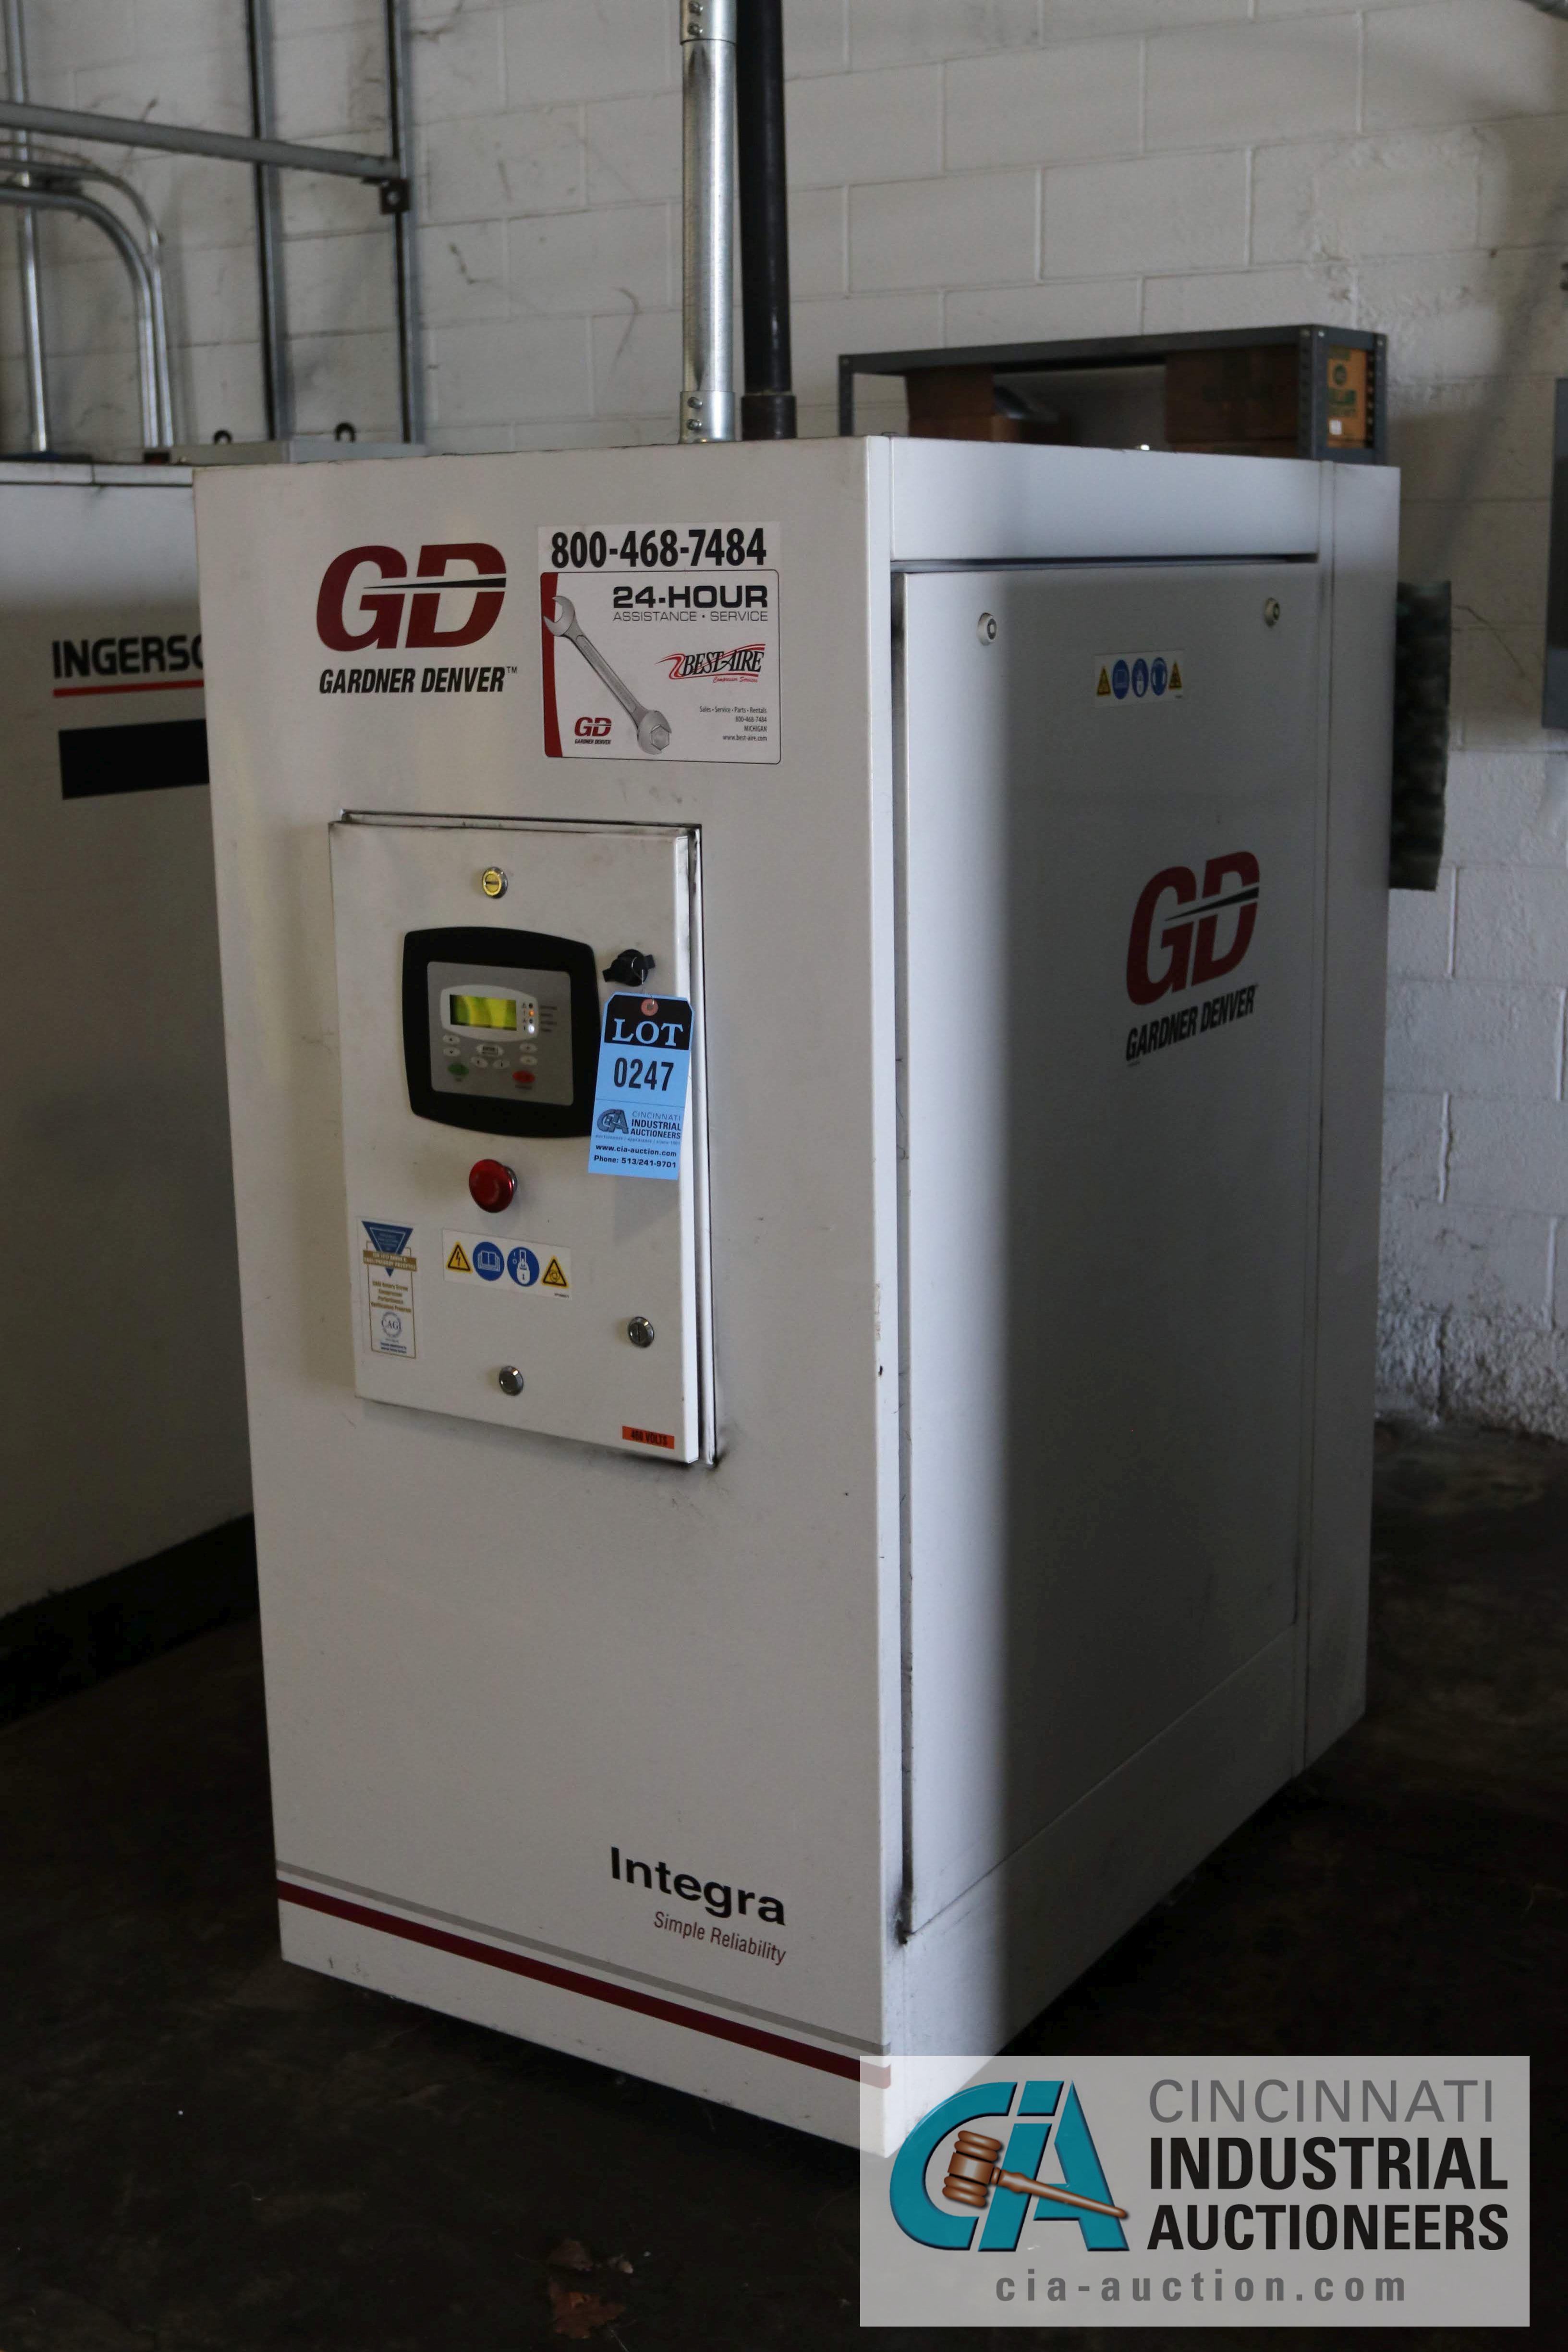 30 HP GARDNER DENVER MODEL EFC99J ROTARY SCREW AIR COMPRESSOR; 125 PSIG, 9,827 HOURS - $150.00